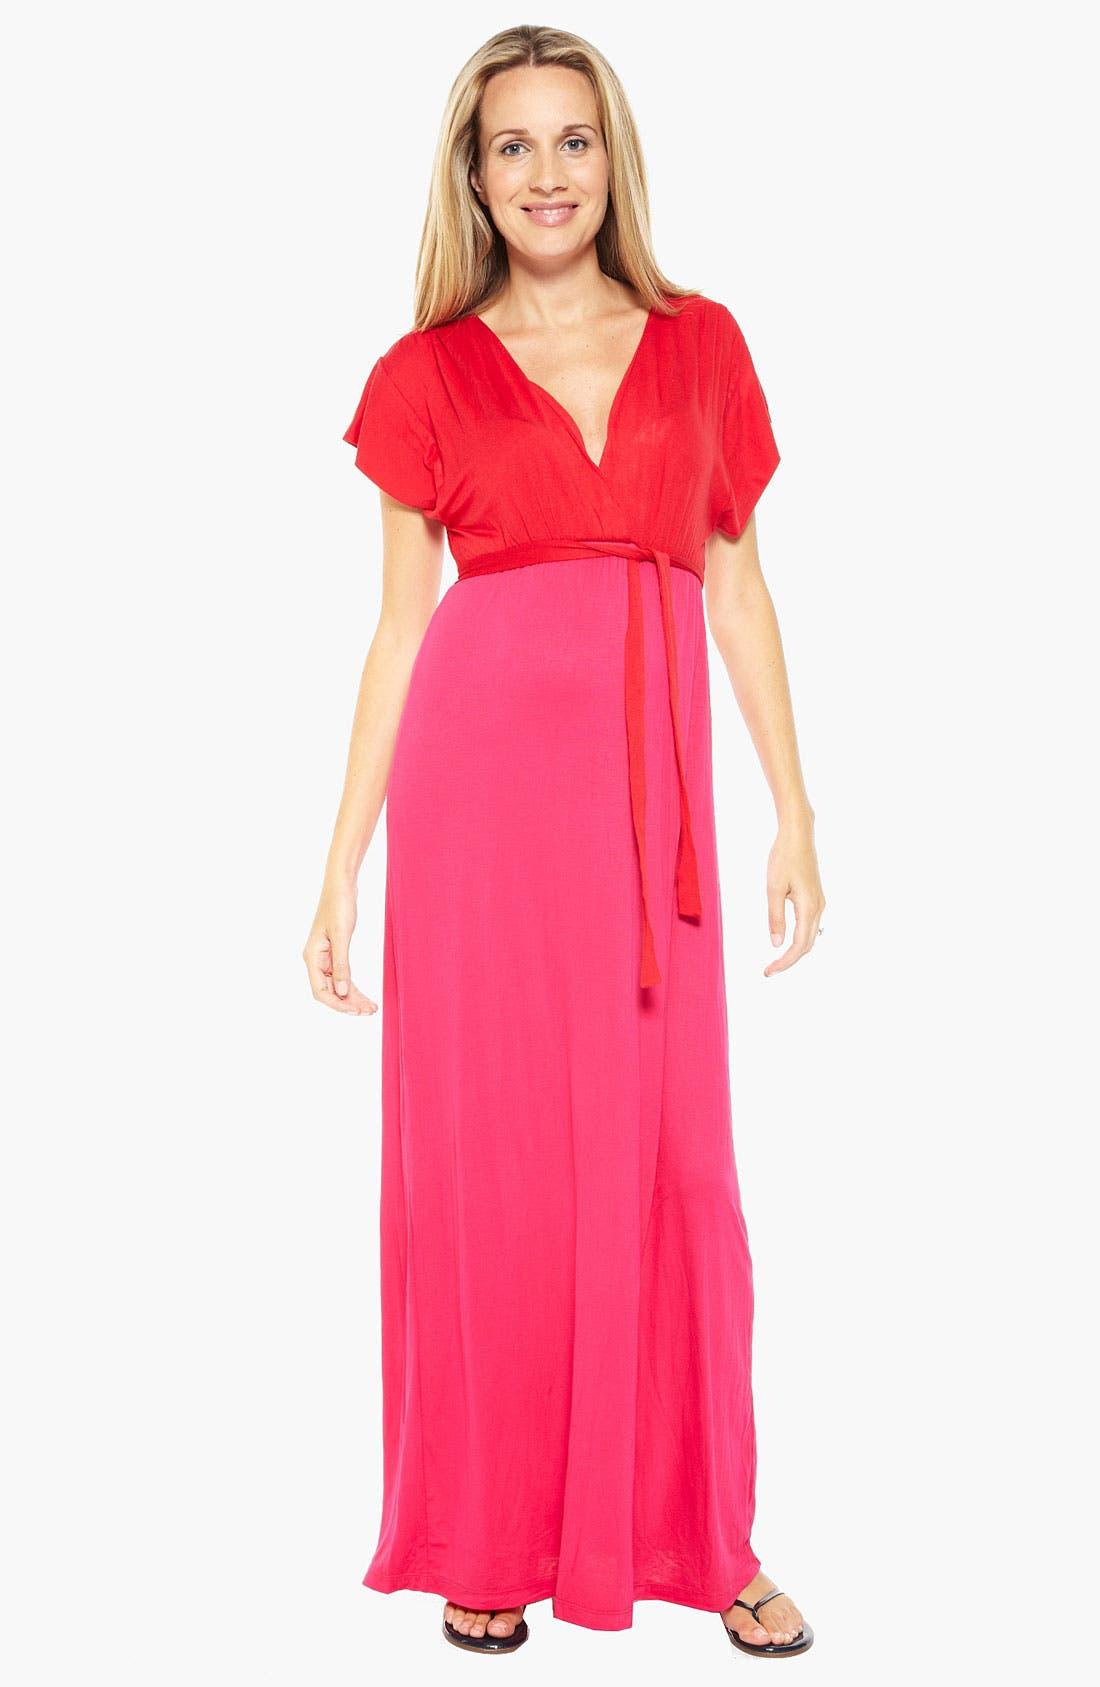 Alternate Image 1 Selected - Nom Maternity 'Skyler' Maternity Maxi Dress